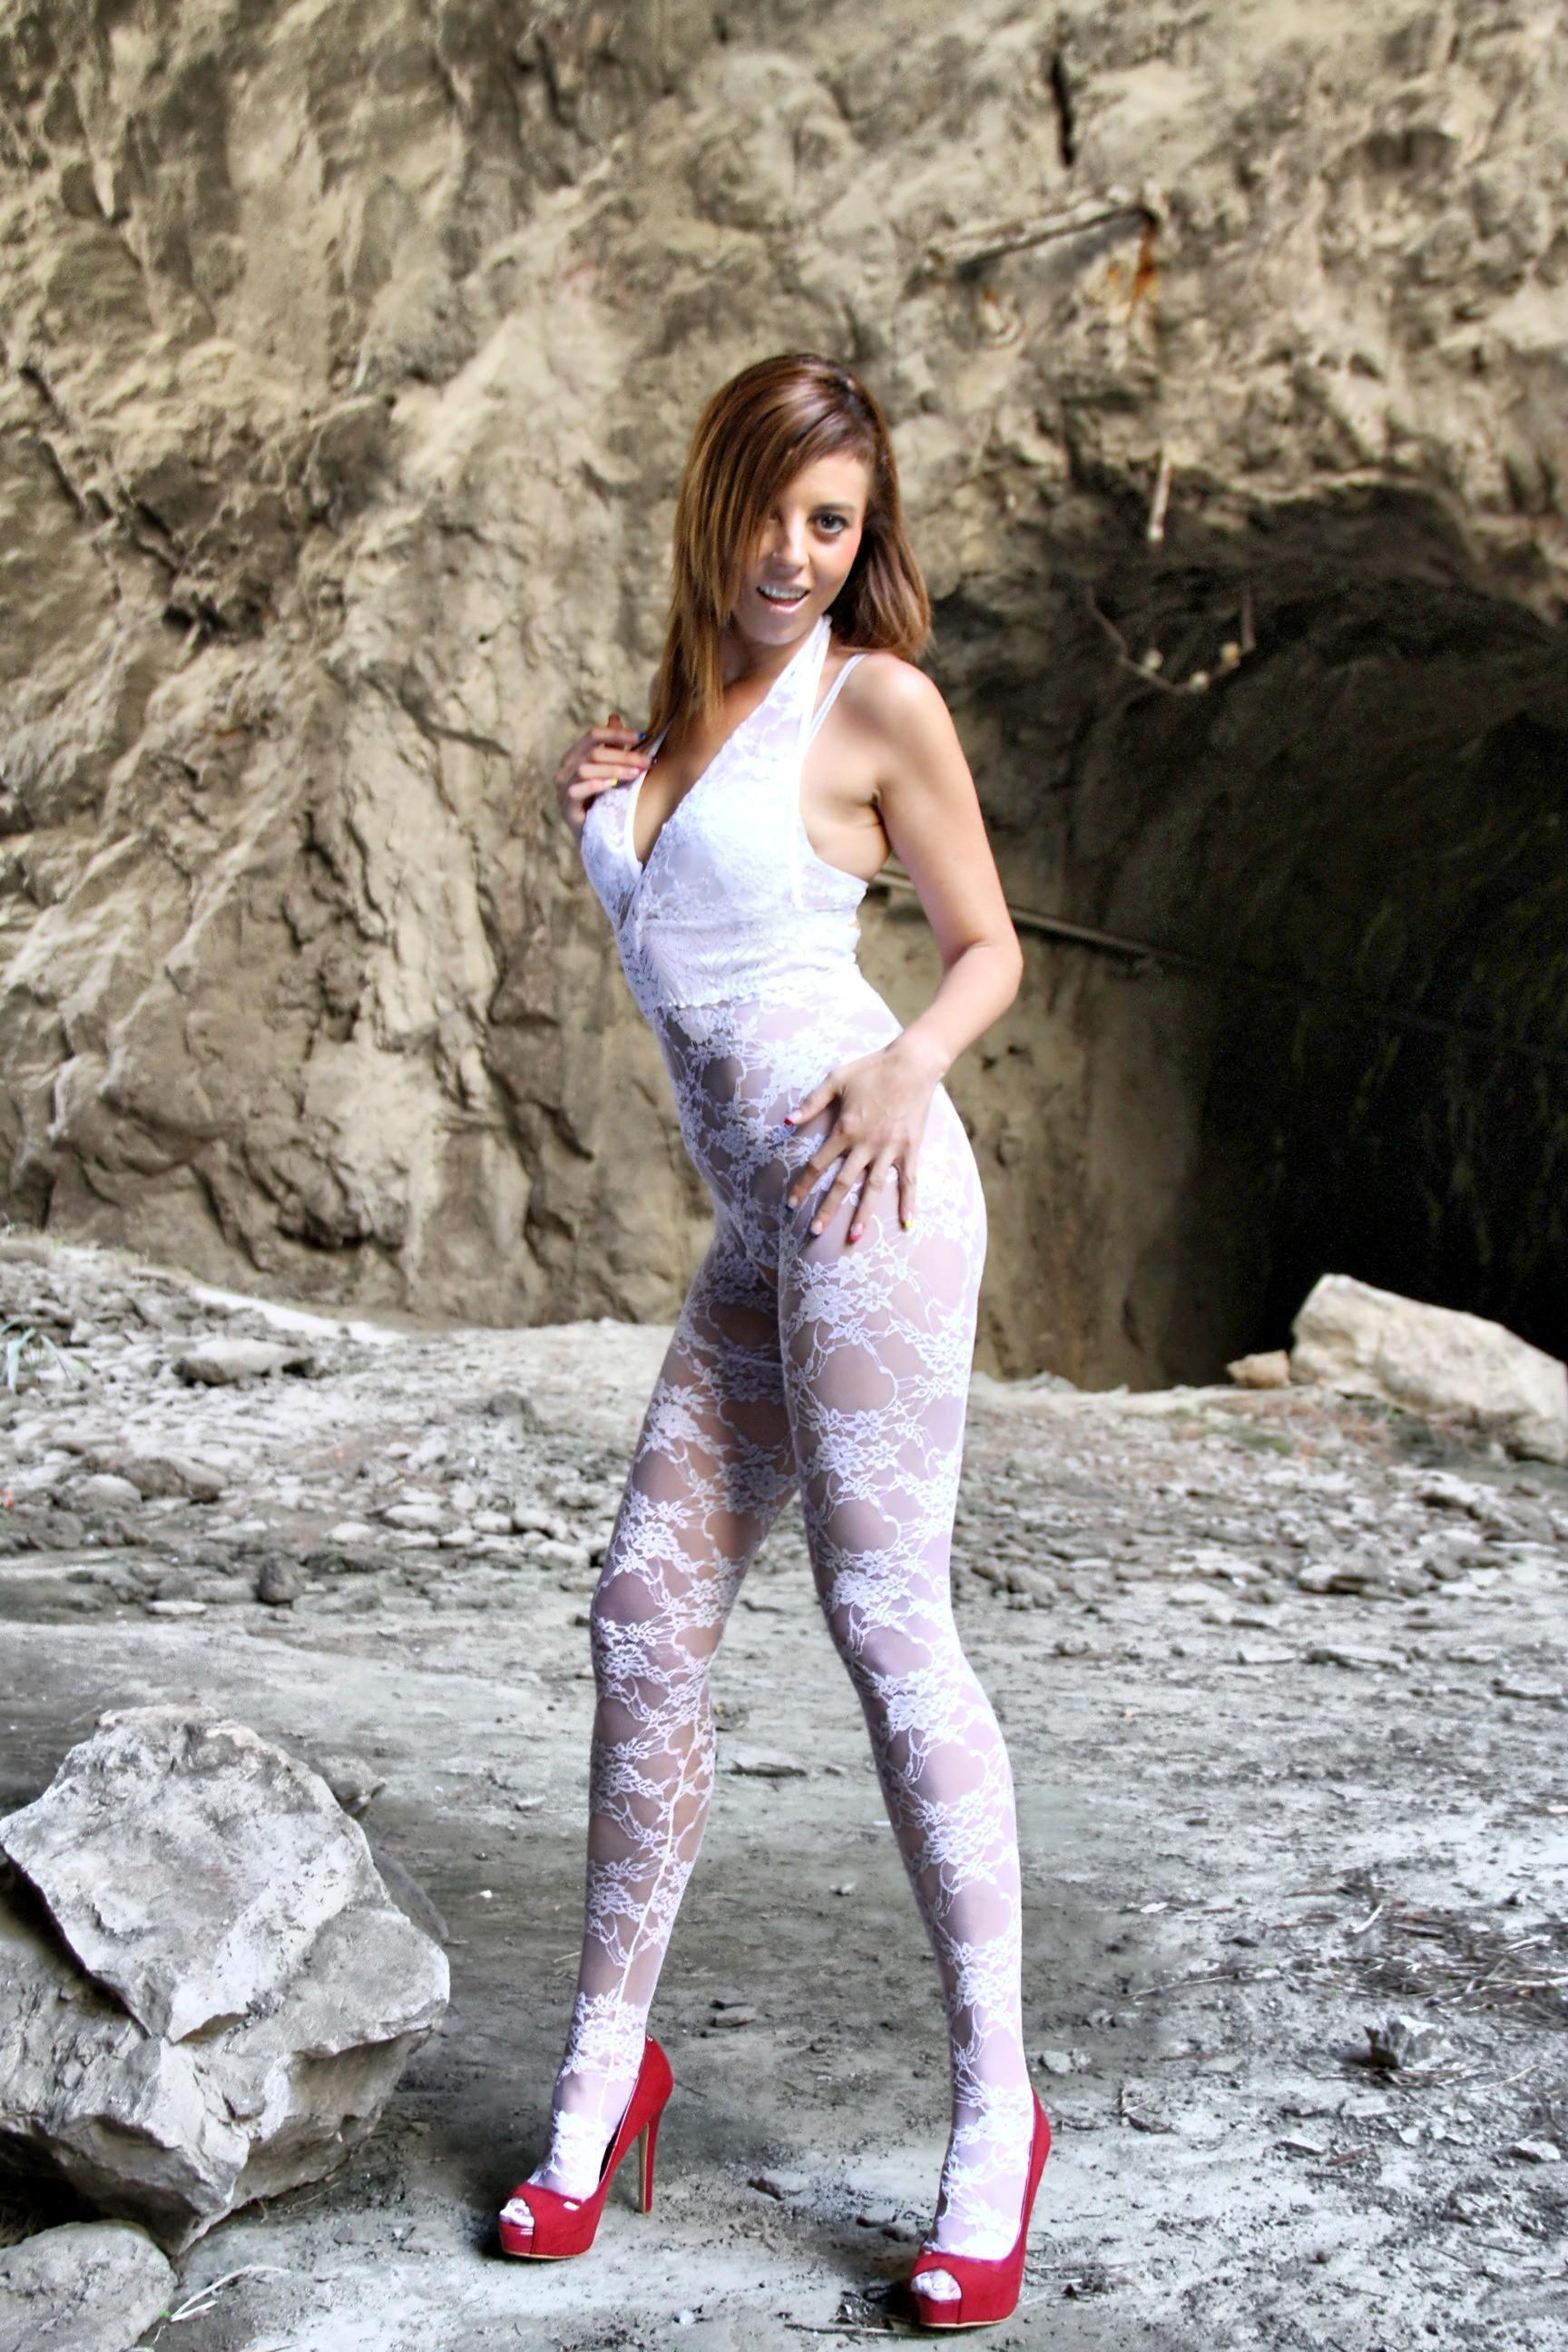 bianca resa - Bianca Resa Free Sexy Photo #001